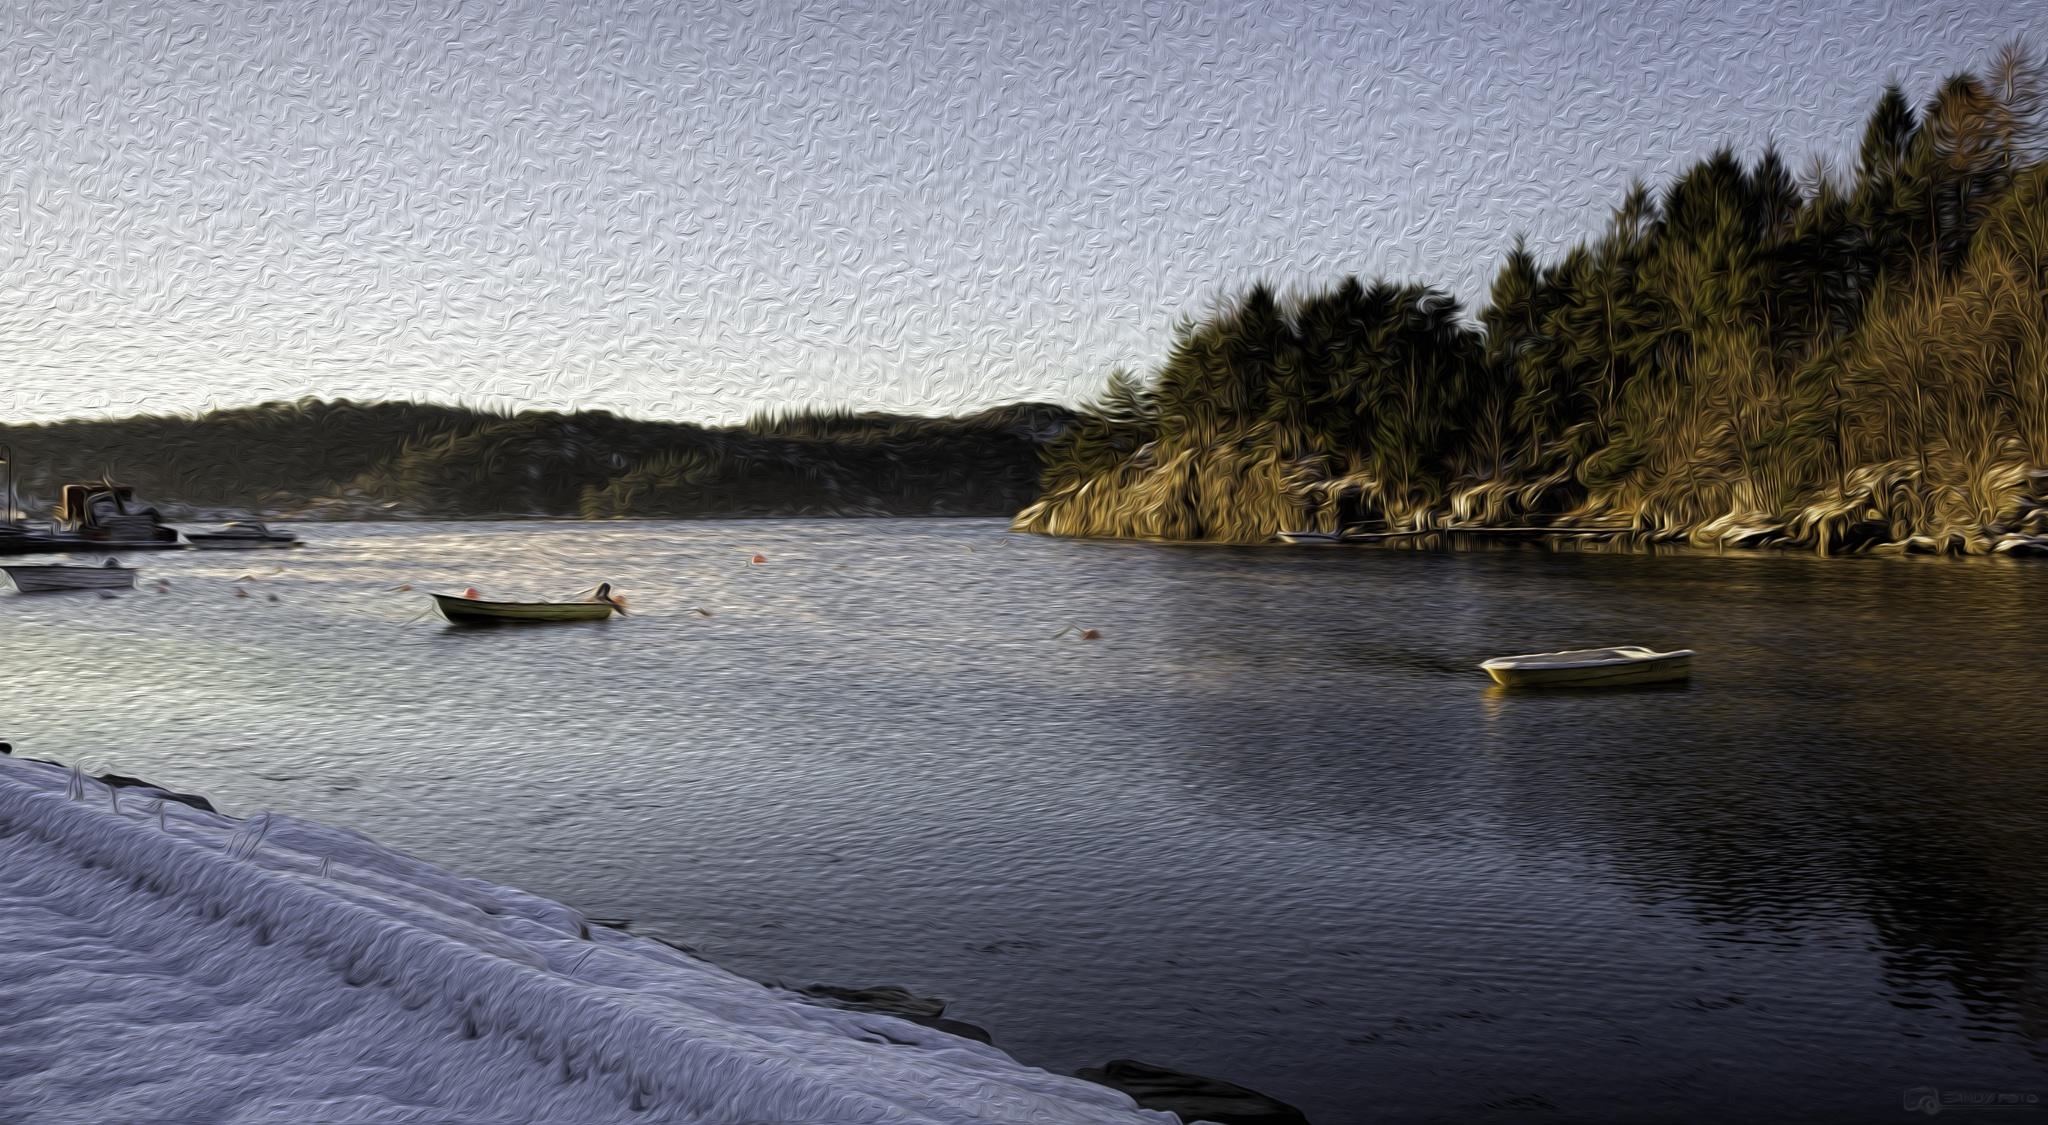 Lysefjorden, Os painting by tjsandofoto